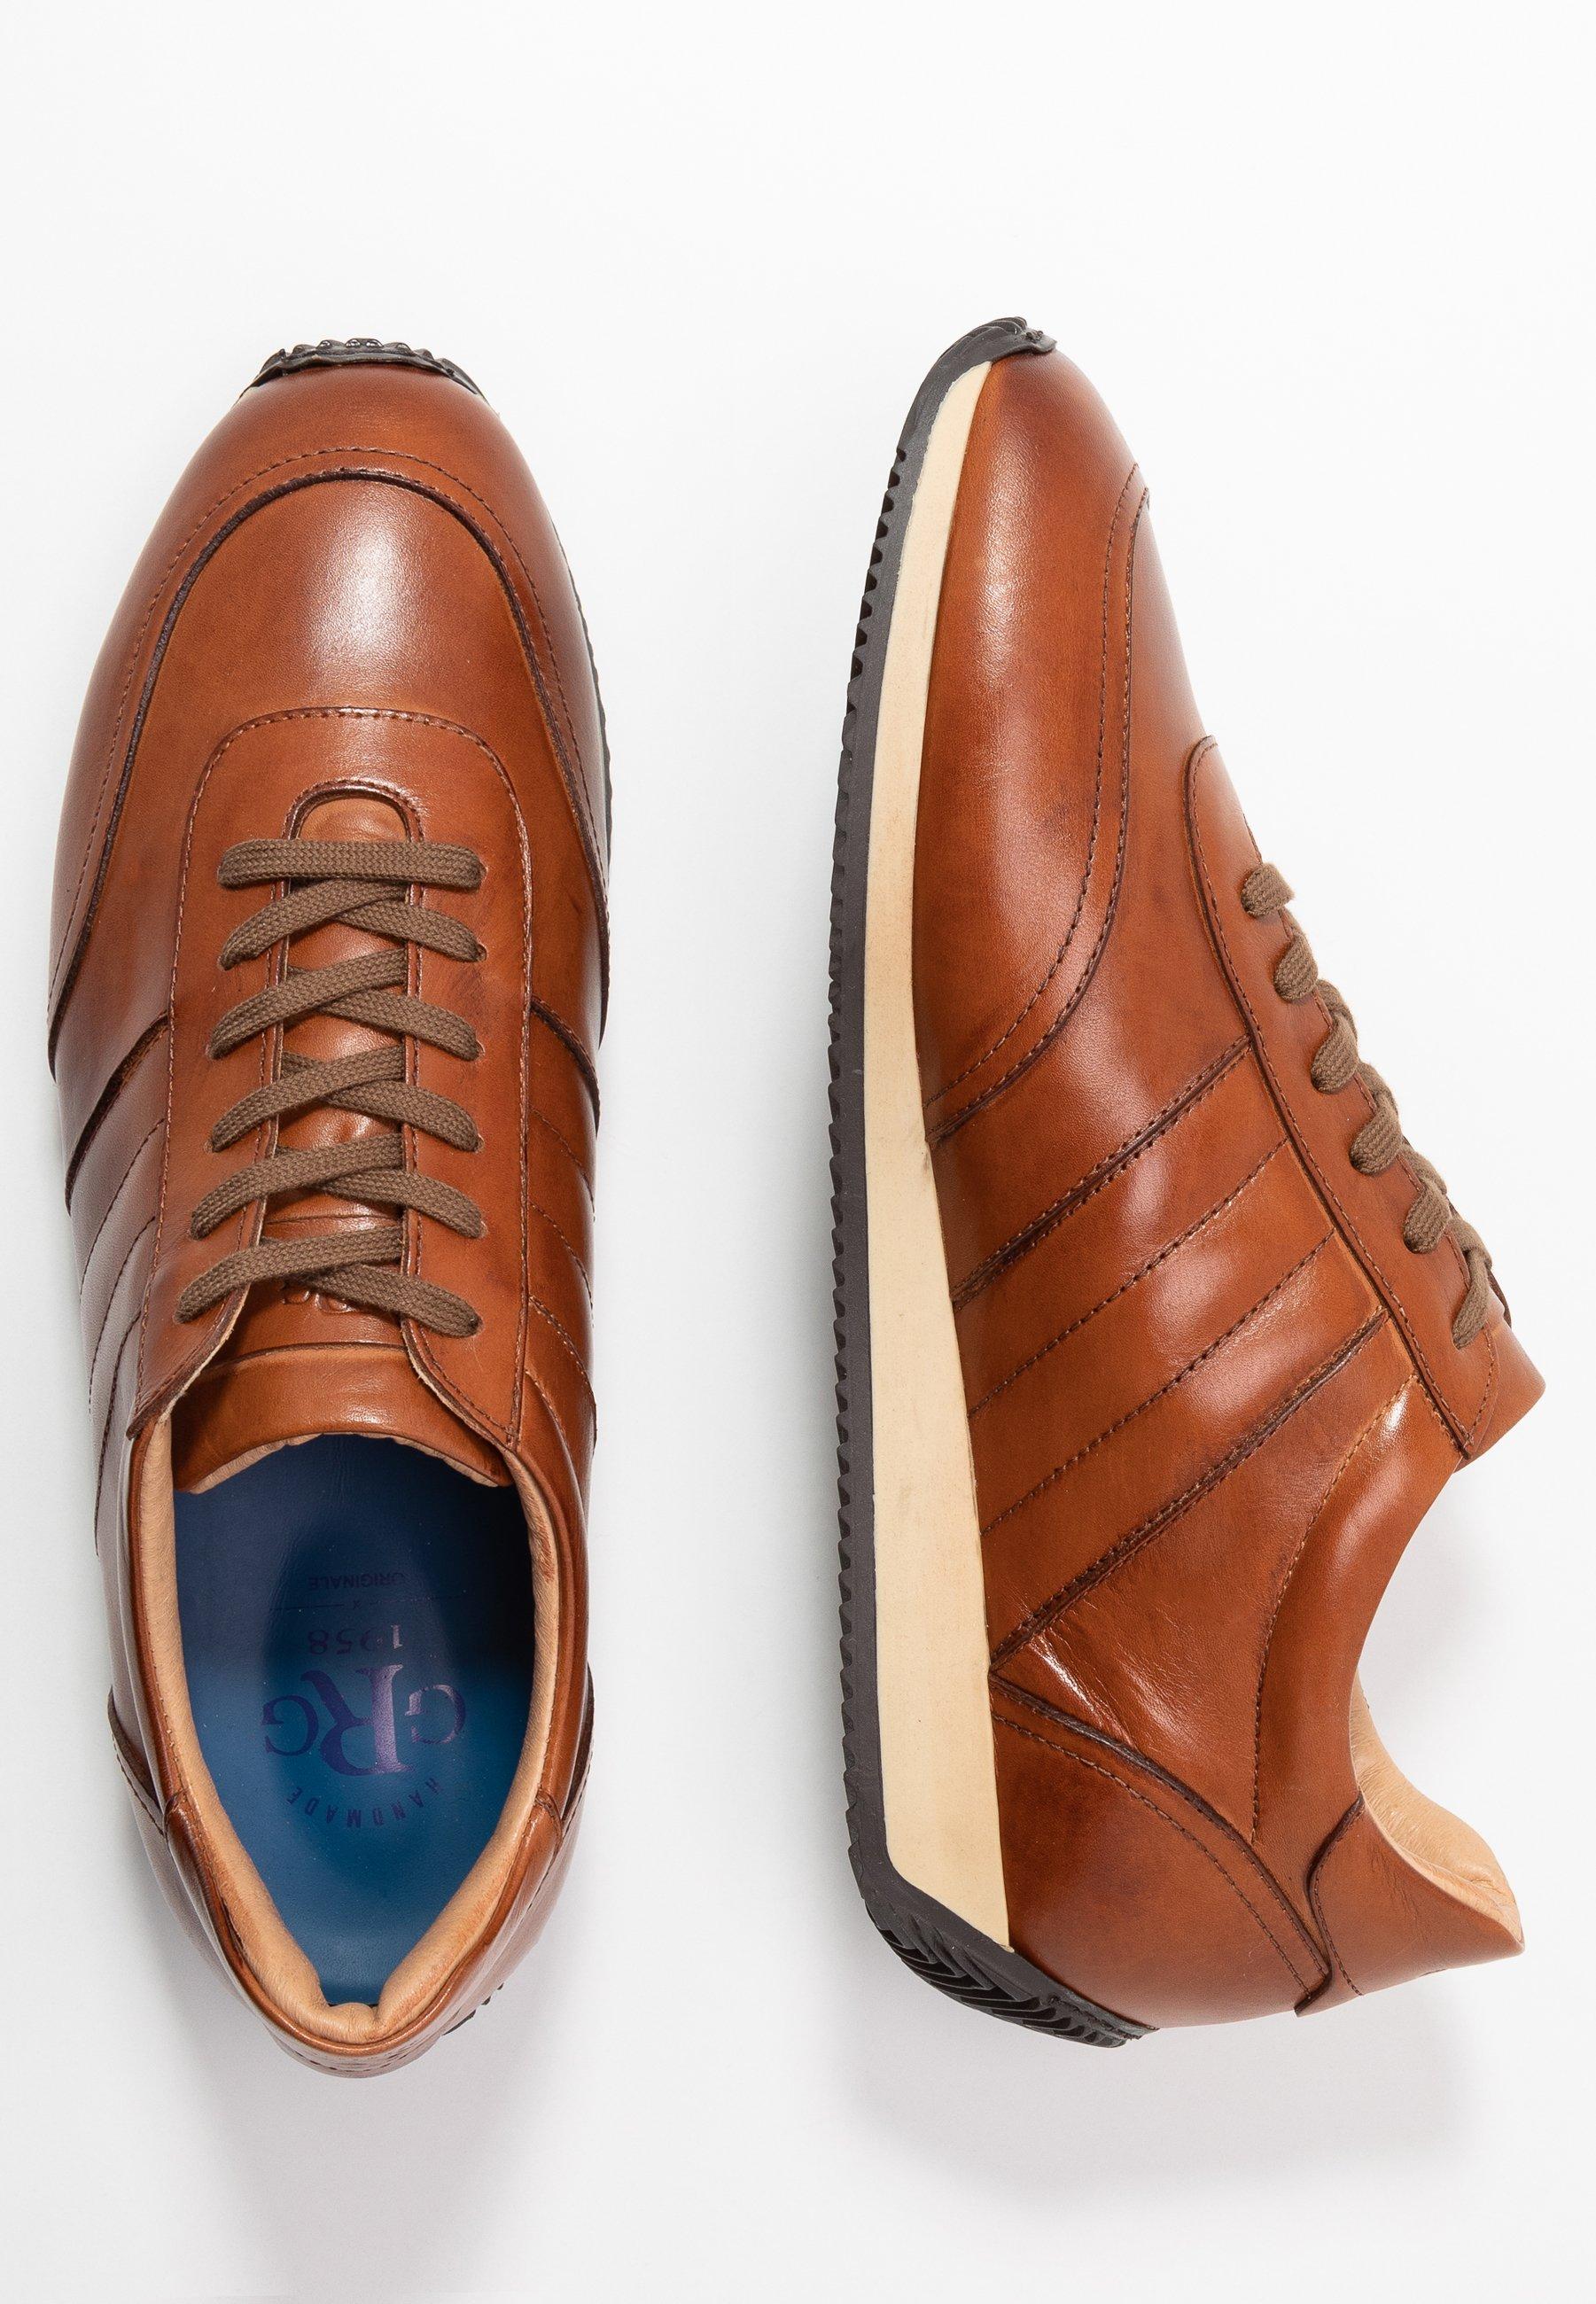 Giorgio 1958 Sneakers - cognac